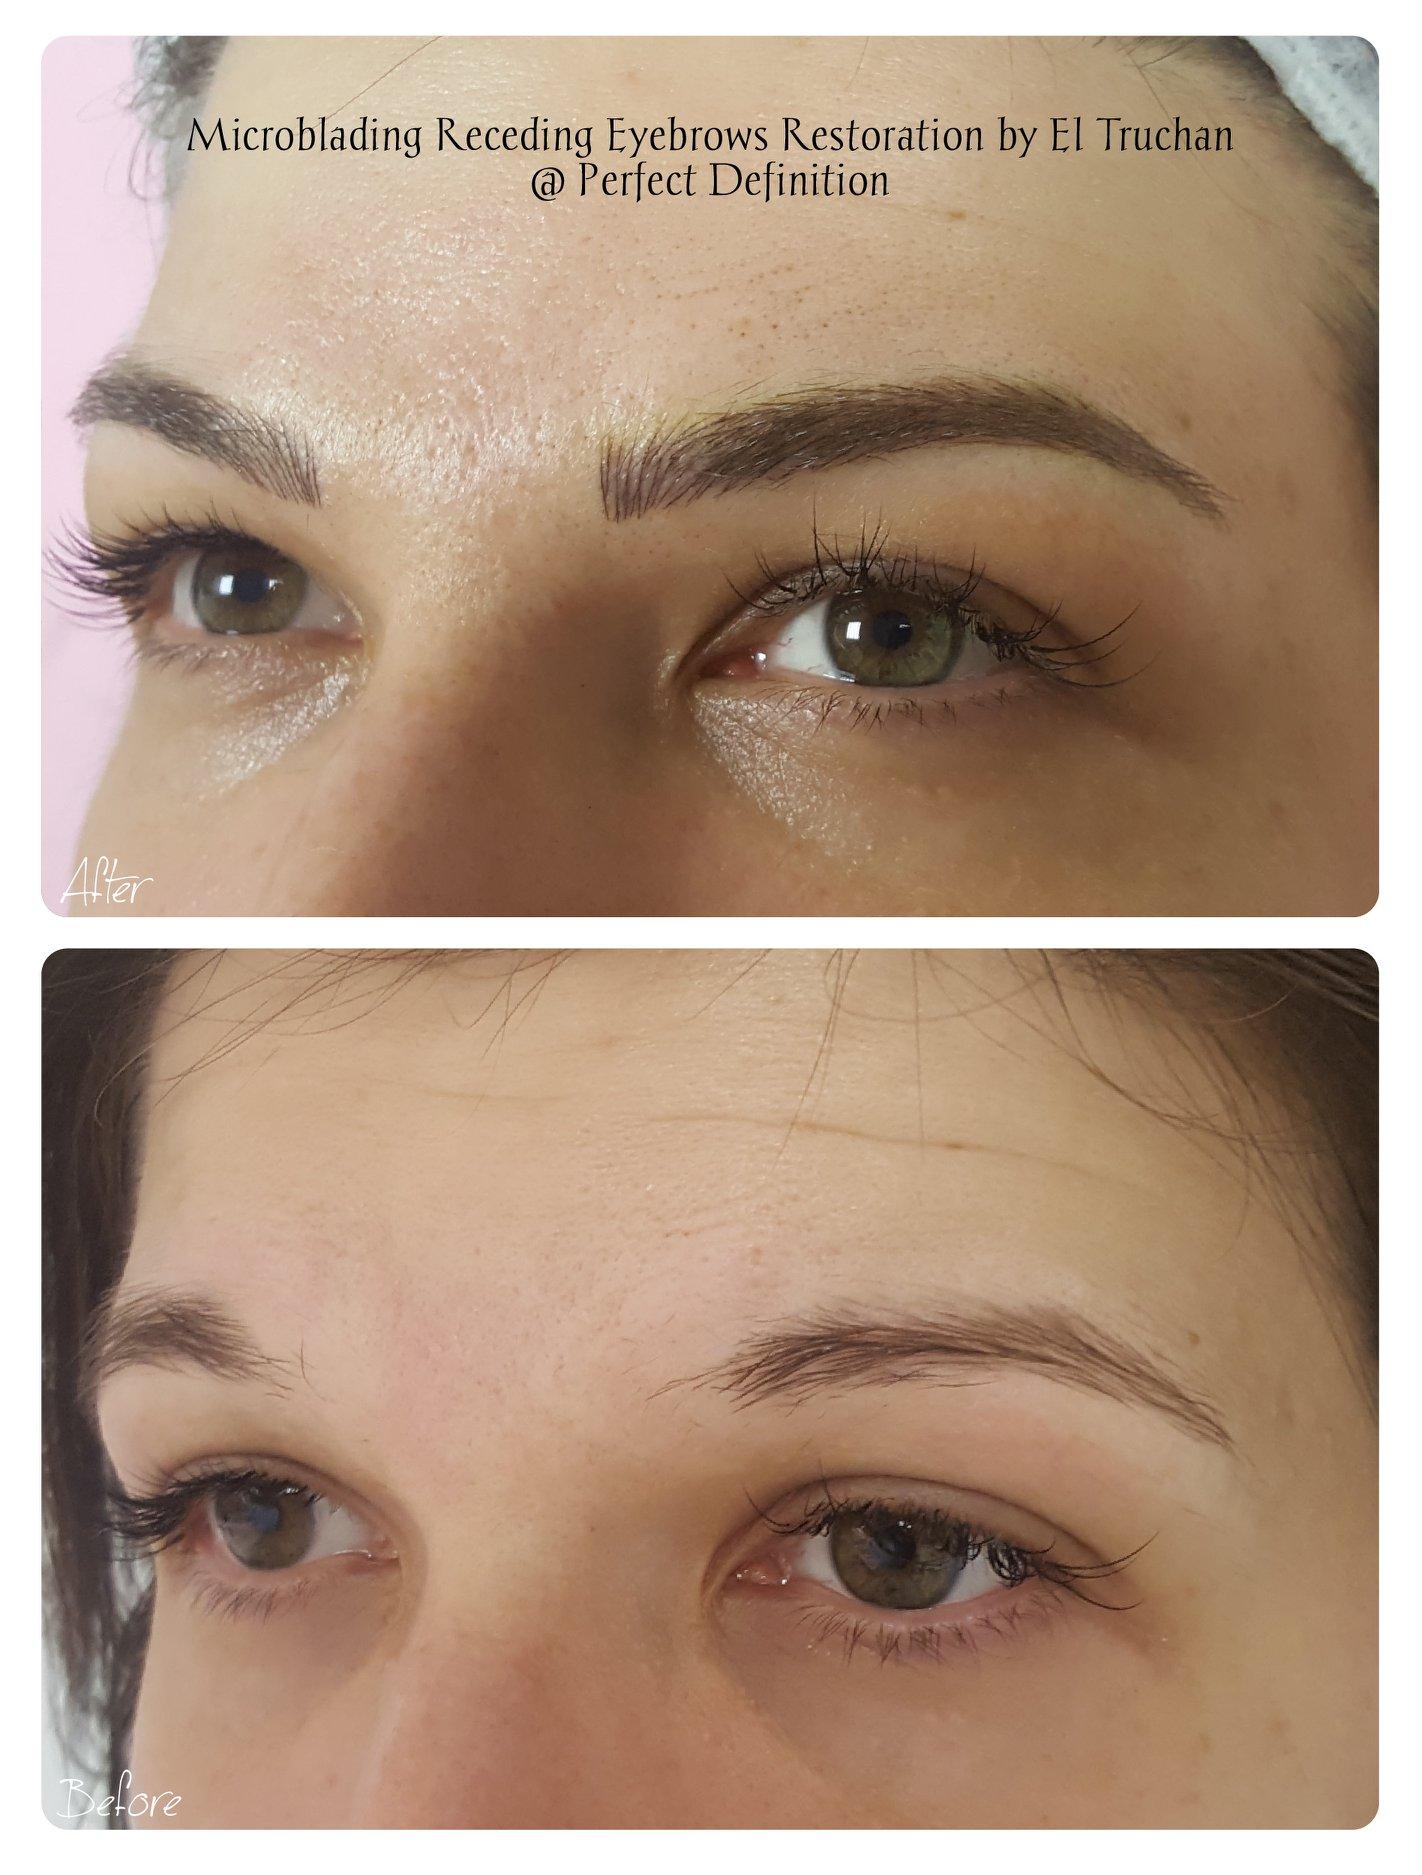 Microblading Receding Eyebrows Restorati